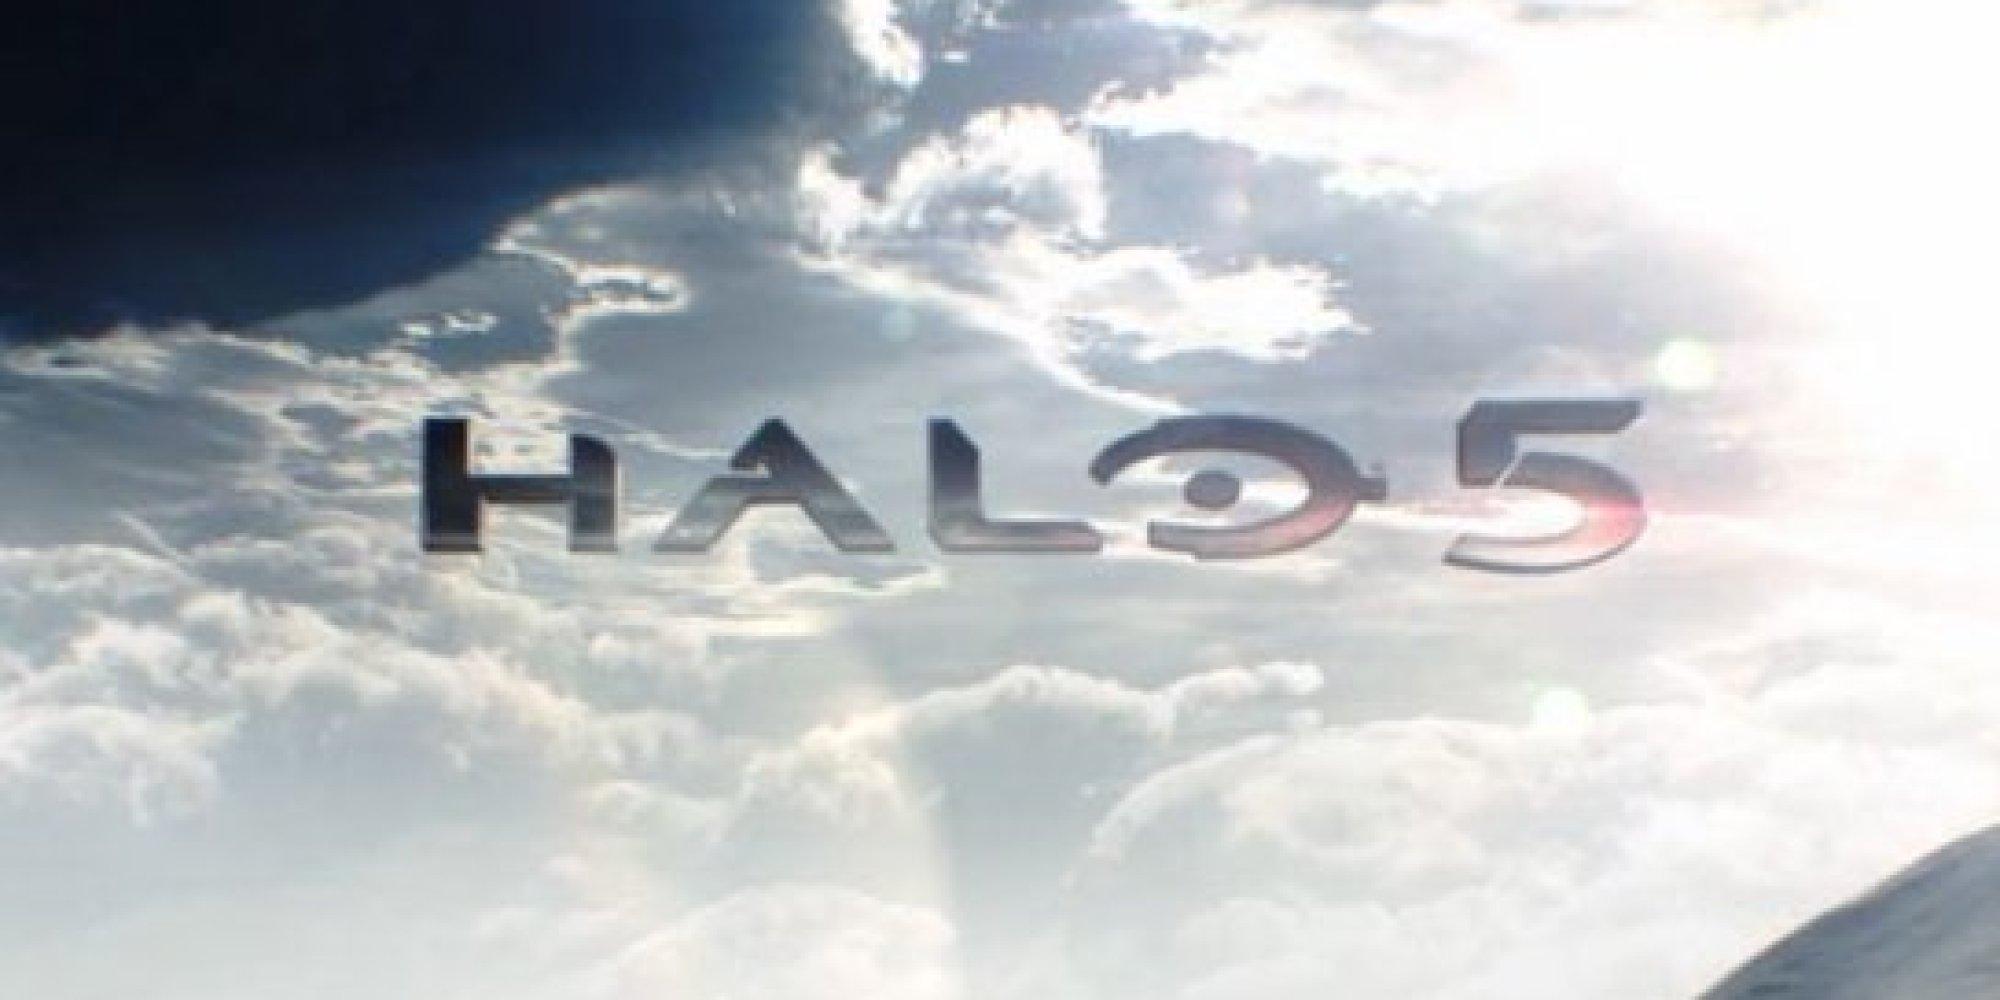 Release date for halo 5 in Australia